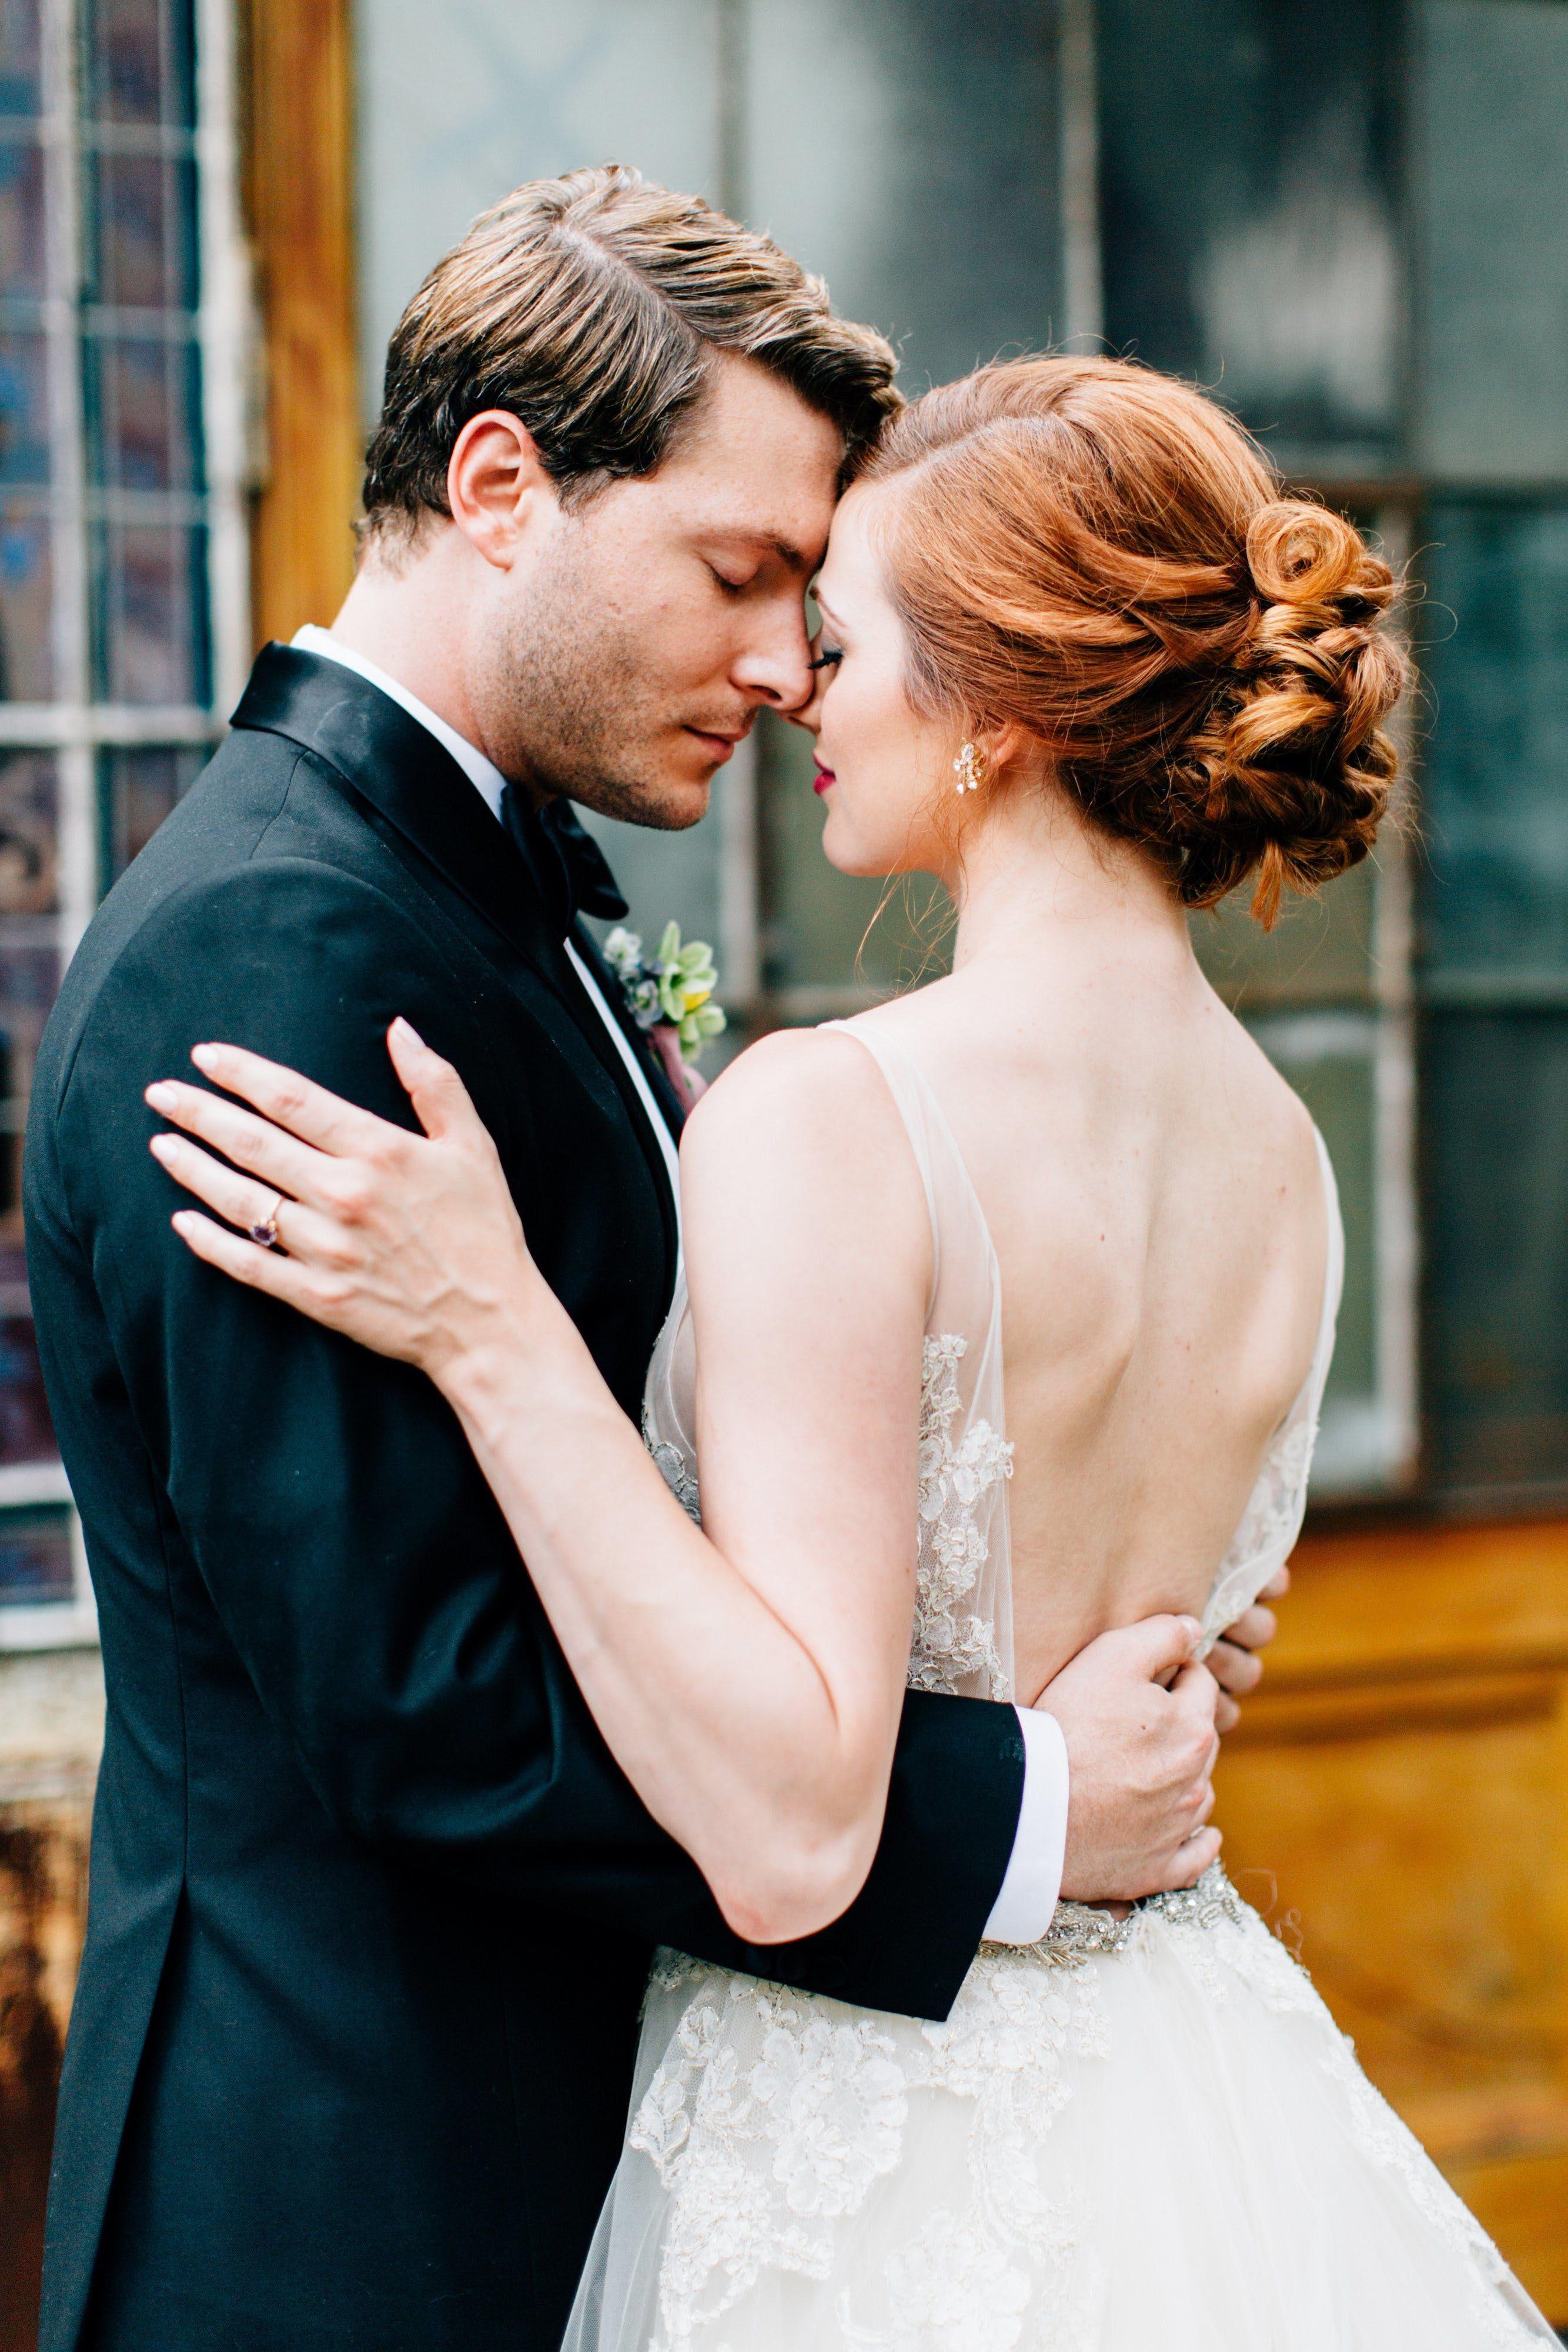 Elegant, OrganicInspired Elopement Featured wedding